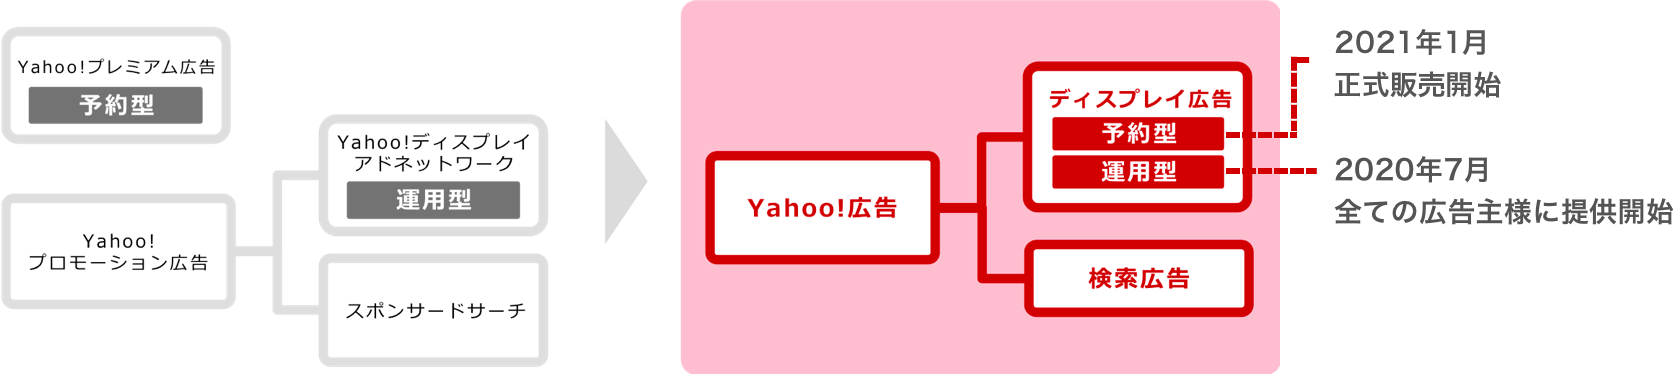 Yahoo!広告リニューアルについて ディスプレイ広告(予約型)は2021年初め頃 順次正式販売開始予定 ディスプレイ広告(運用型)は2020年7月全ての広告主様に提供開始